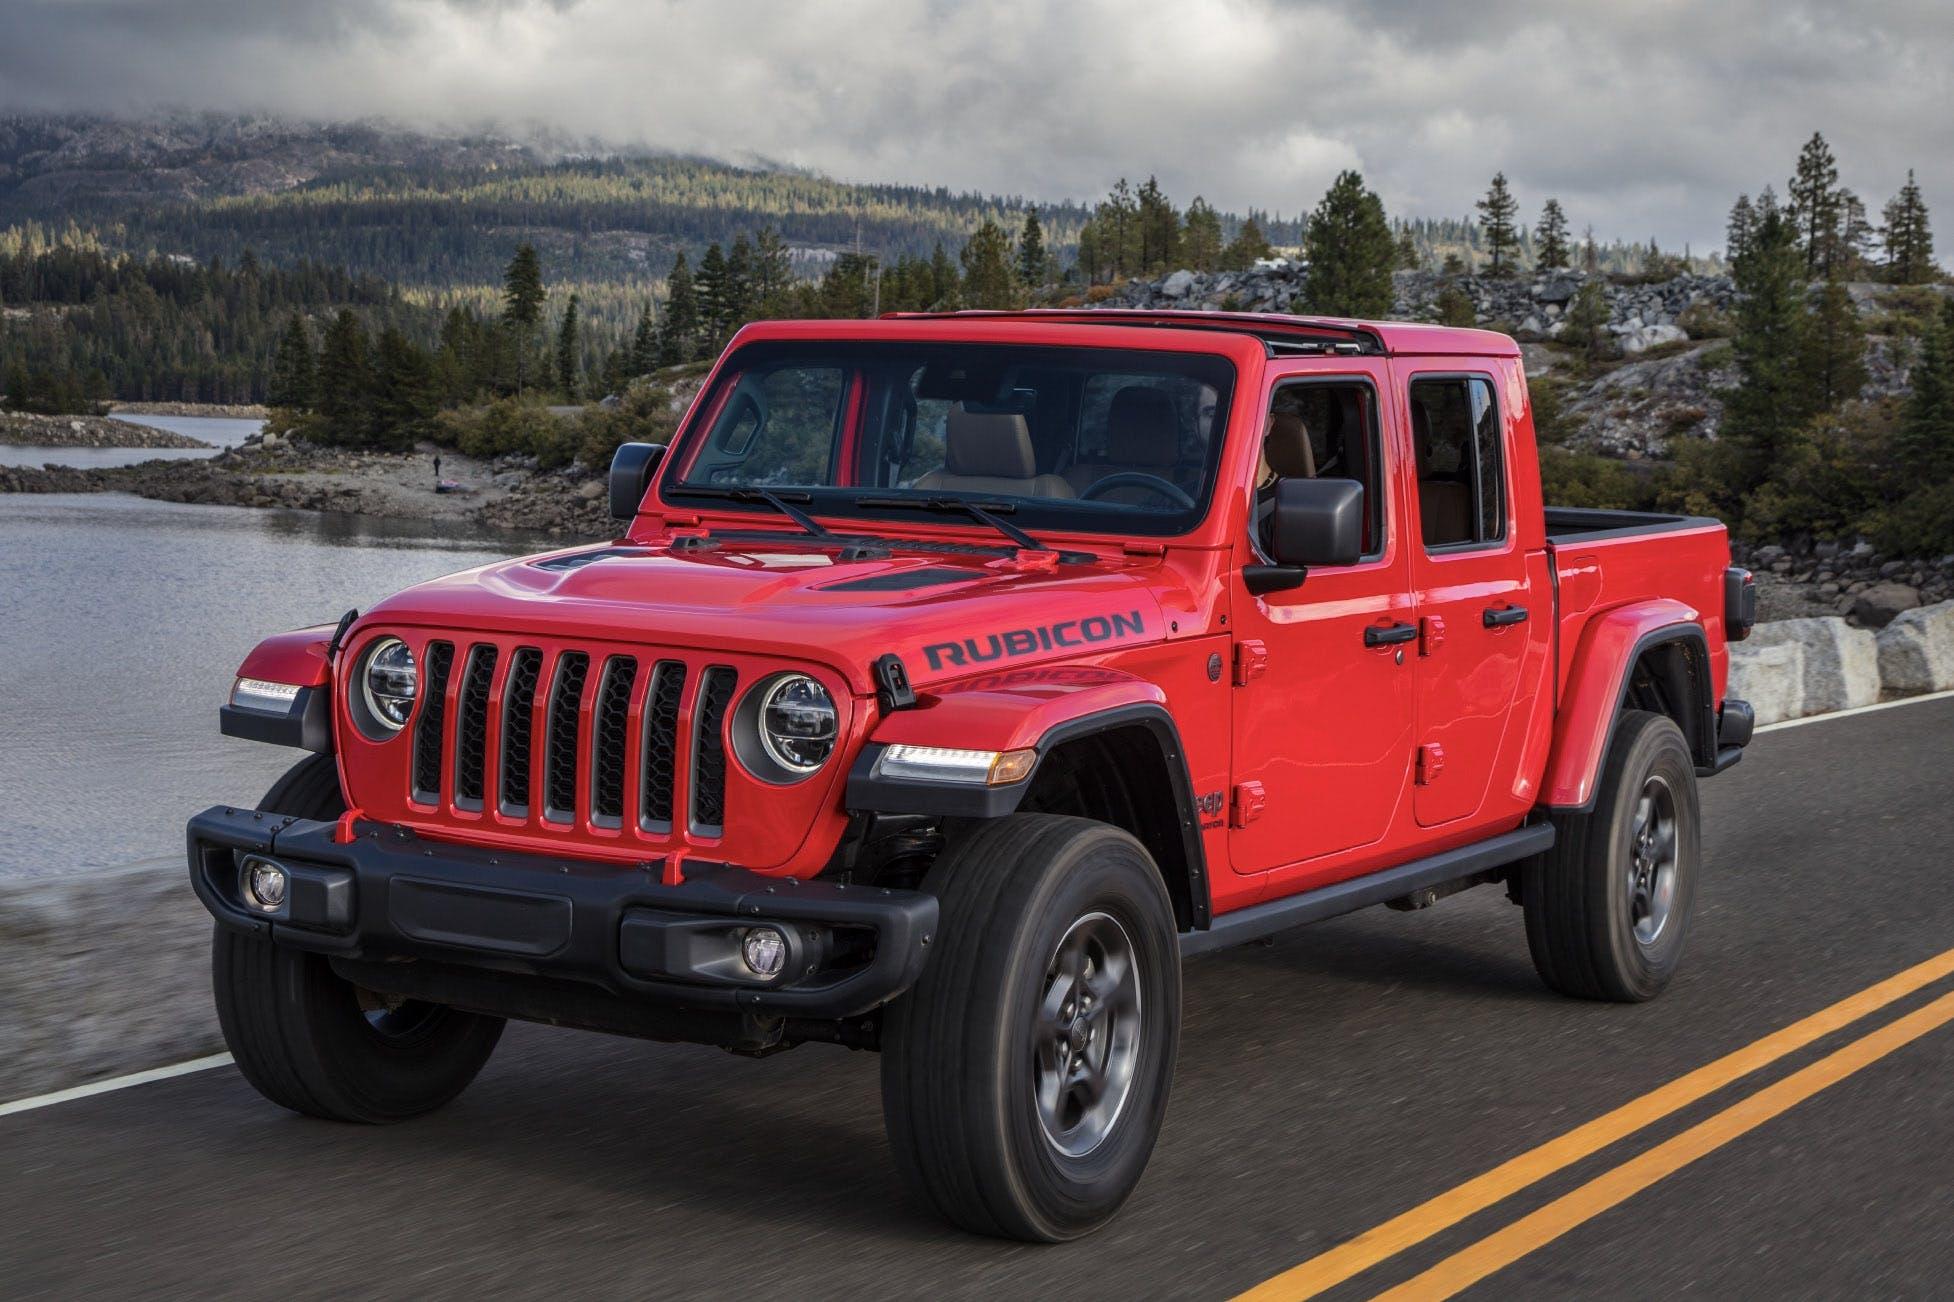 Best Black Friday Sales 2020.Car Deals Best Black Friday Car Deals For 2019 Carfax